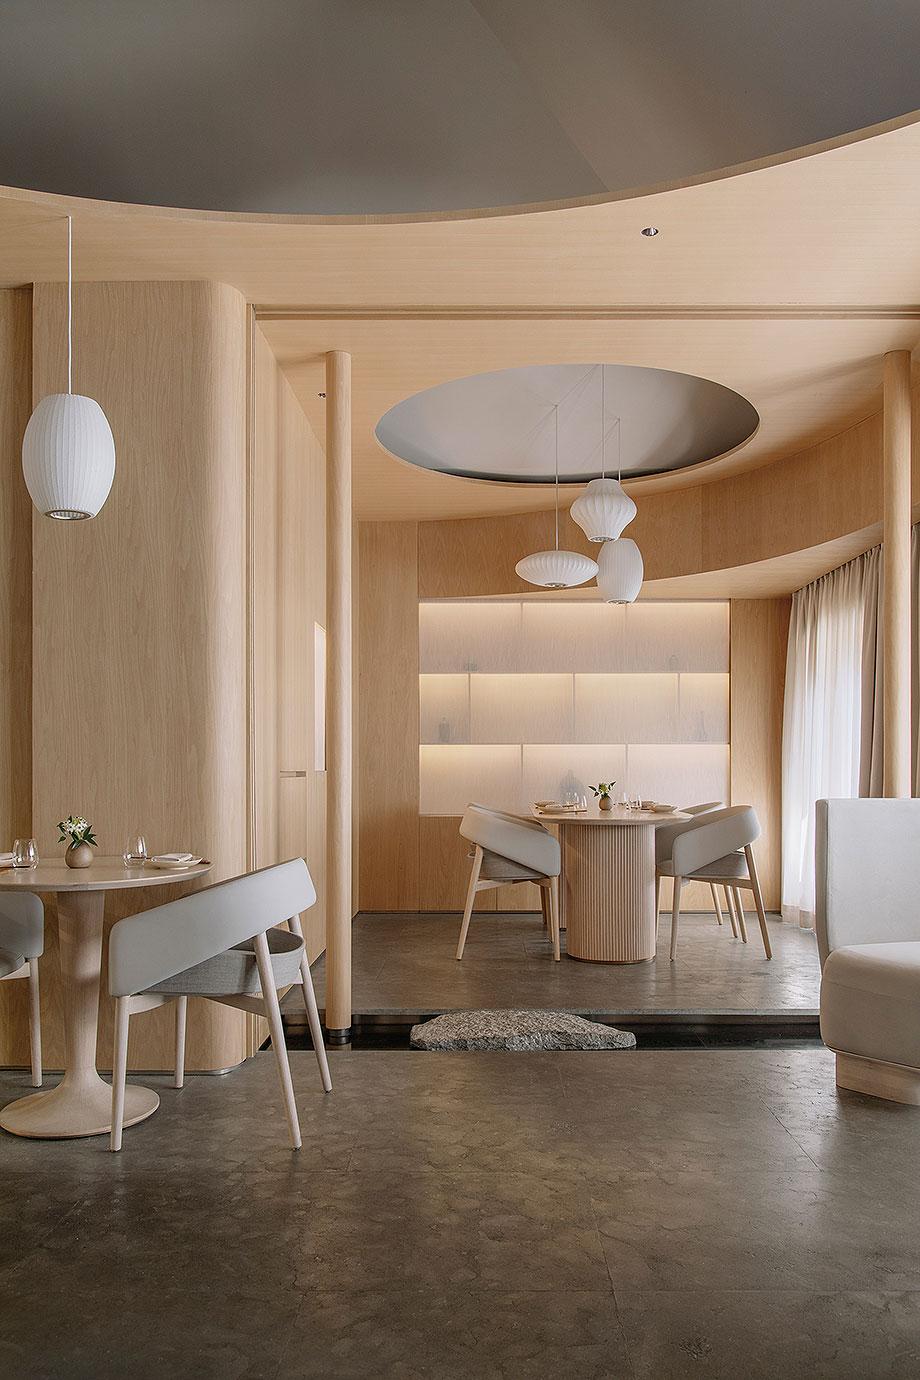 restaurante lunar en shanghai de so studio (1) - foto wen studio